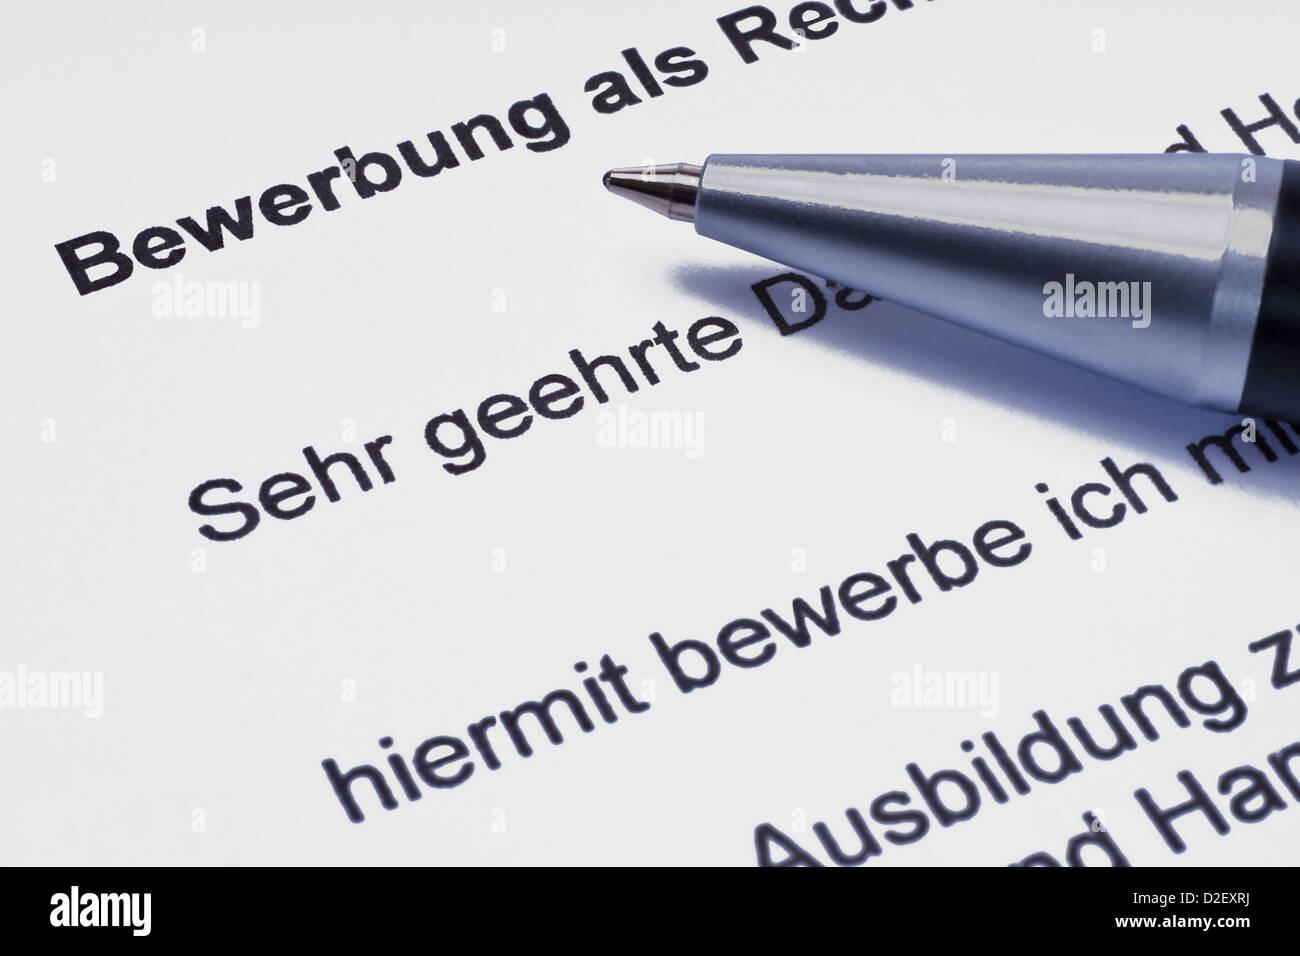 eine Bewerbung, ein Stift liegt dabei | a letter of application, a pen is alongside - Stock Image